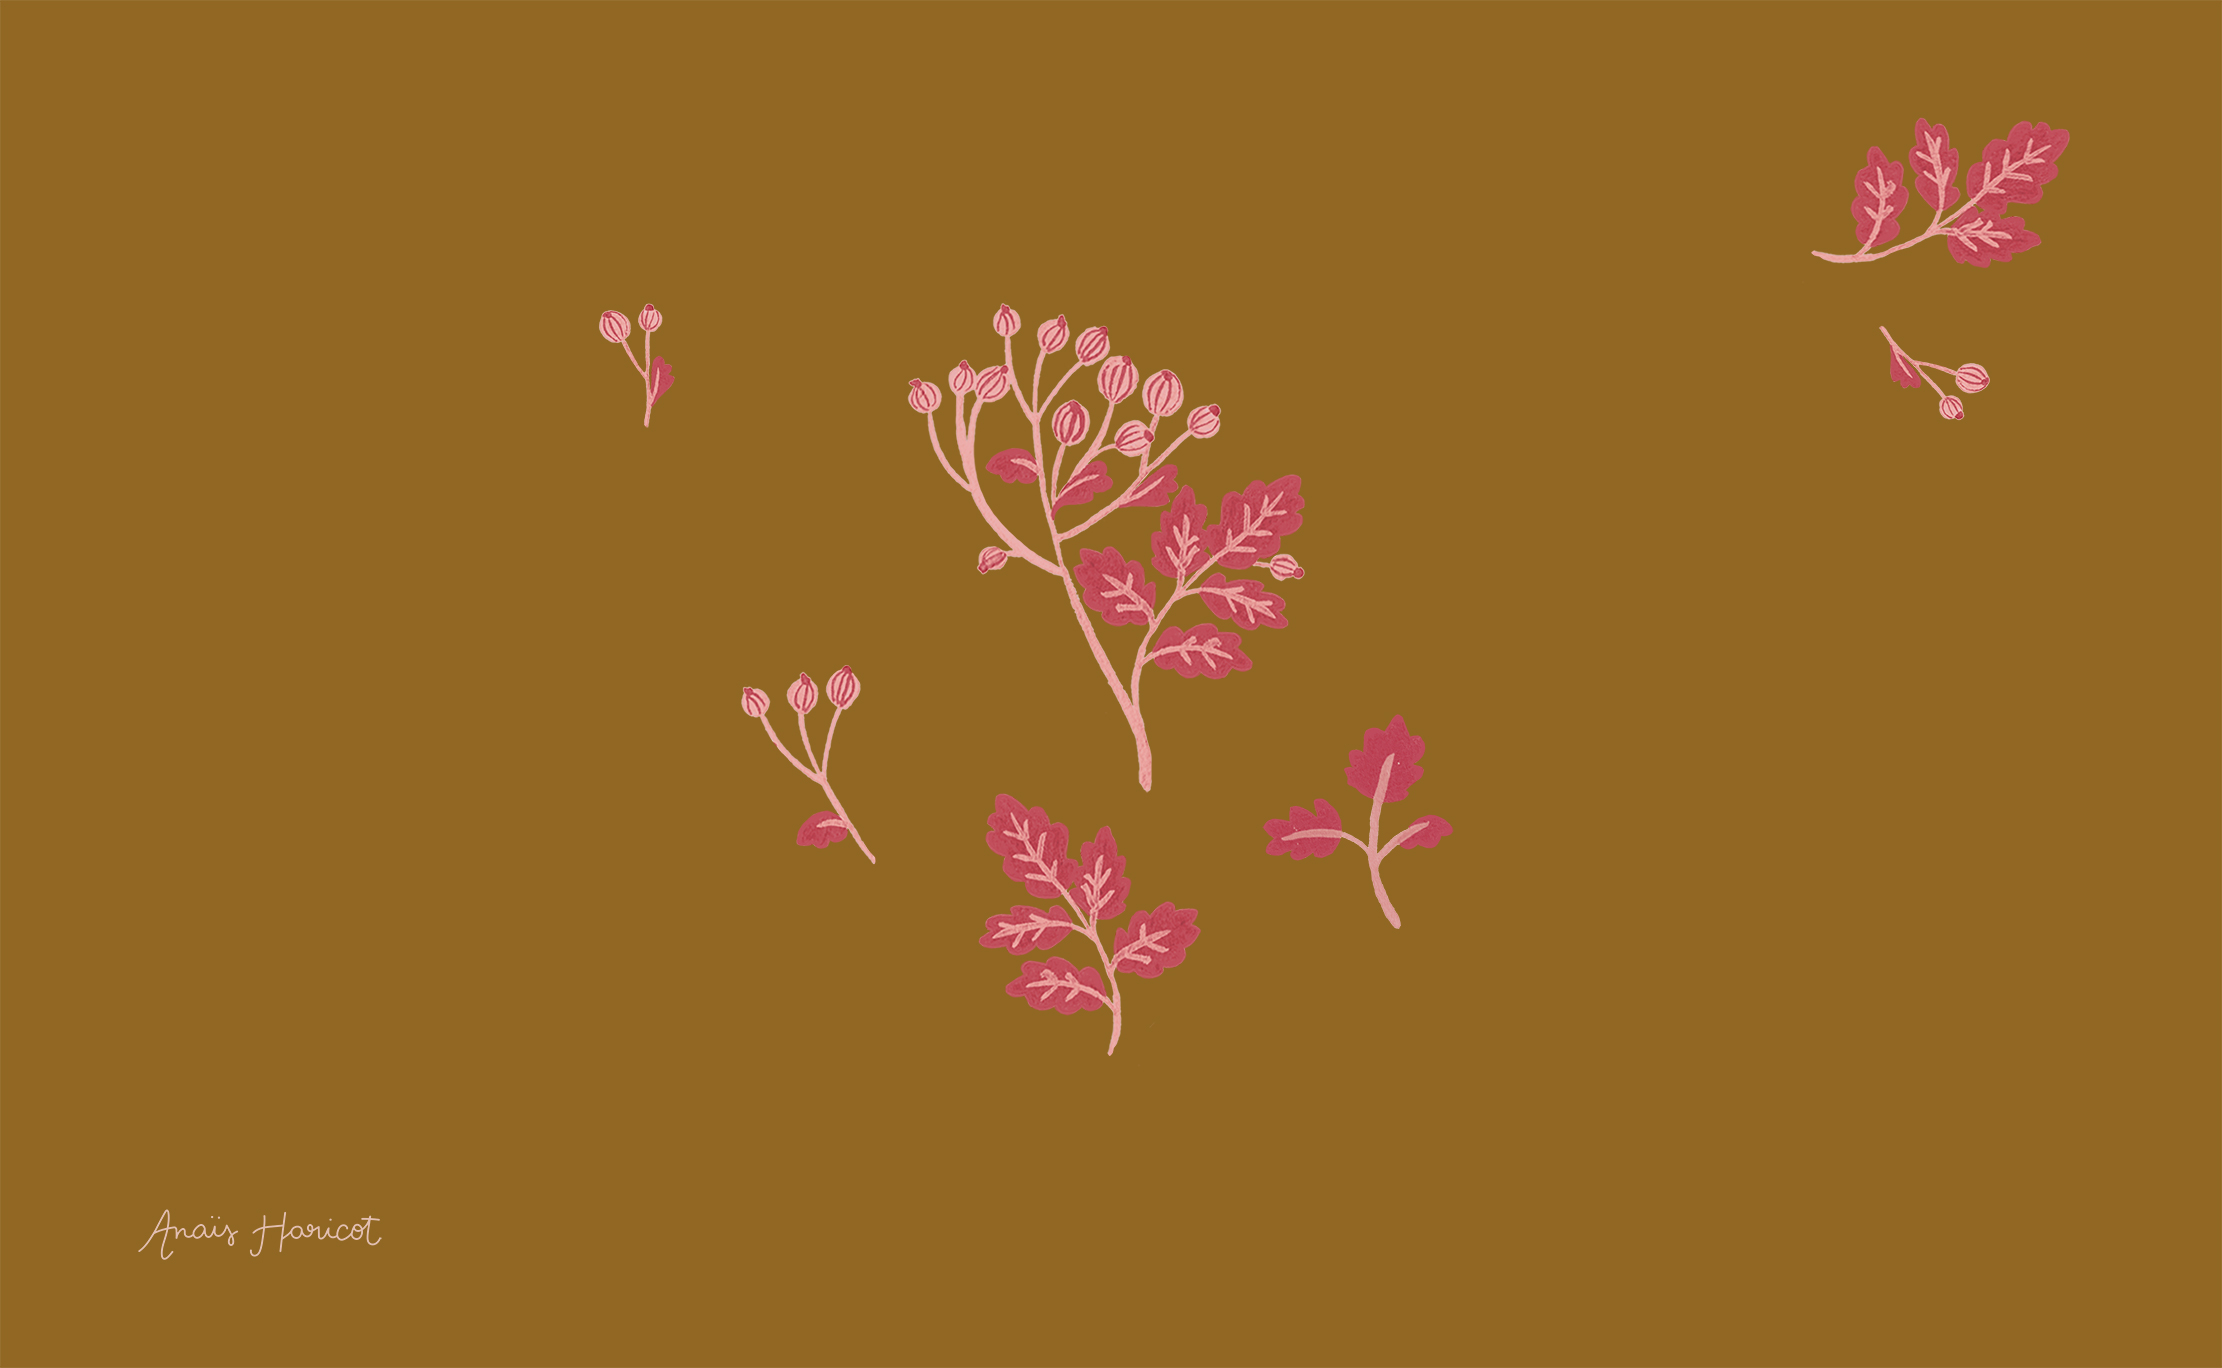 Calendrier Journal Anais Haricot Designer Textile